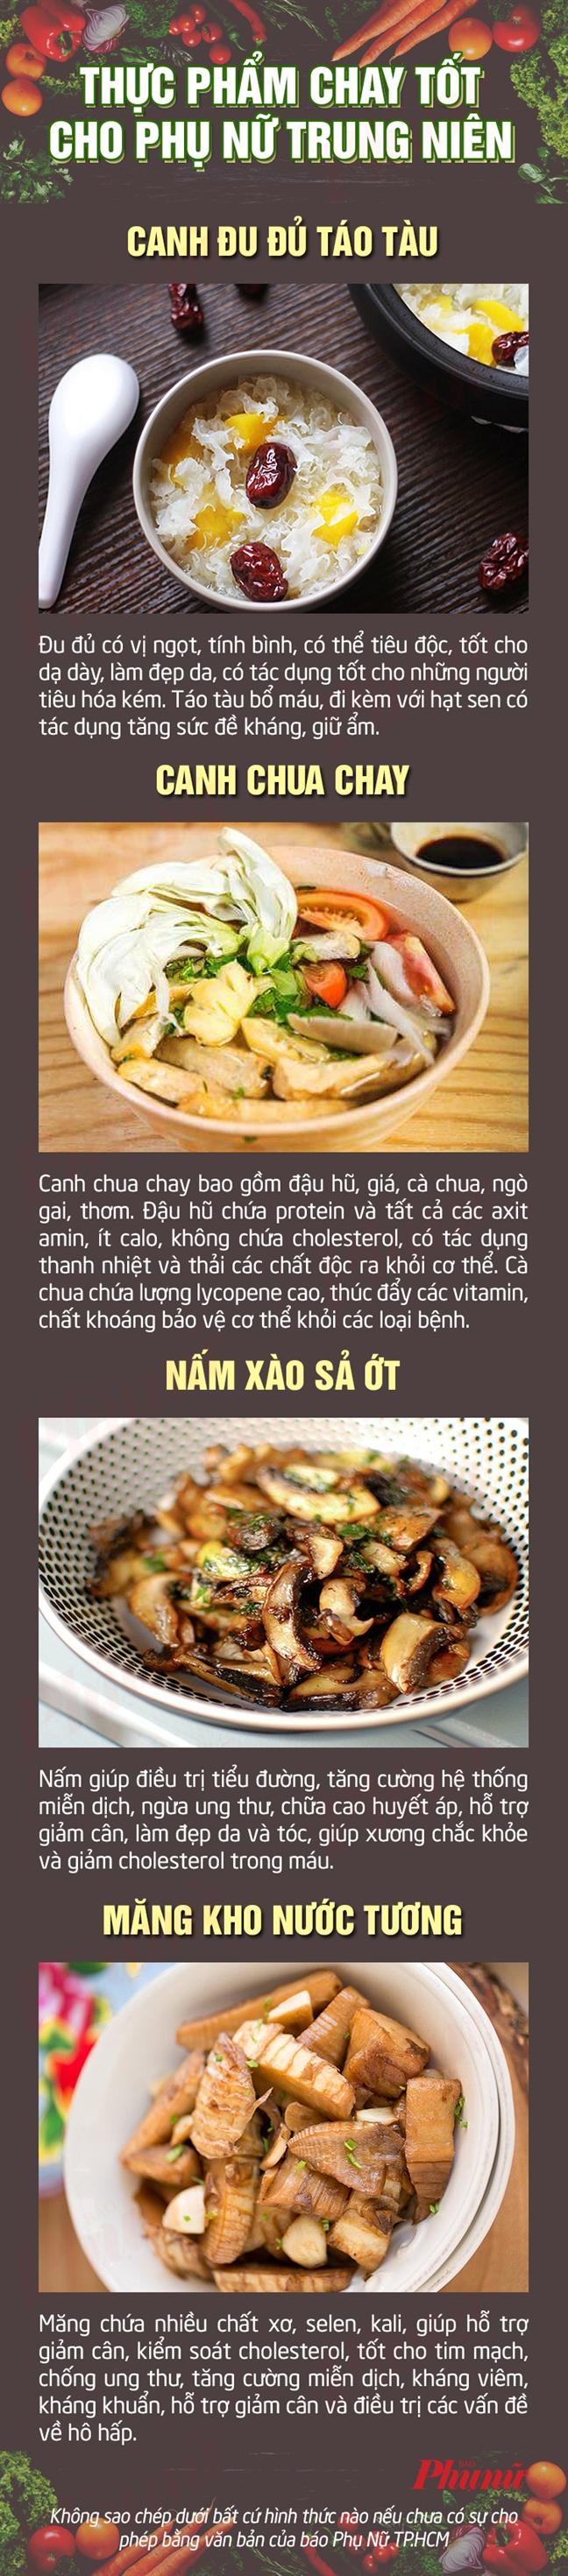 Nhung mon an chay thang 7 tot cho phu nu